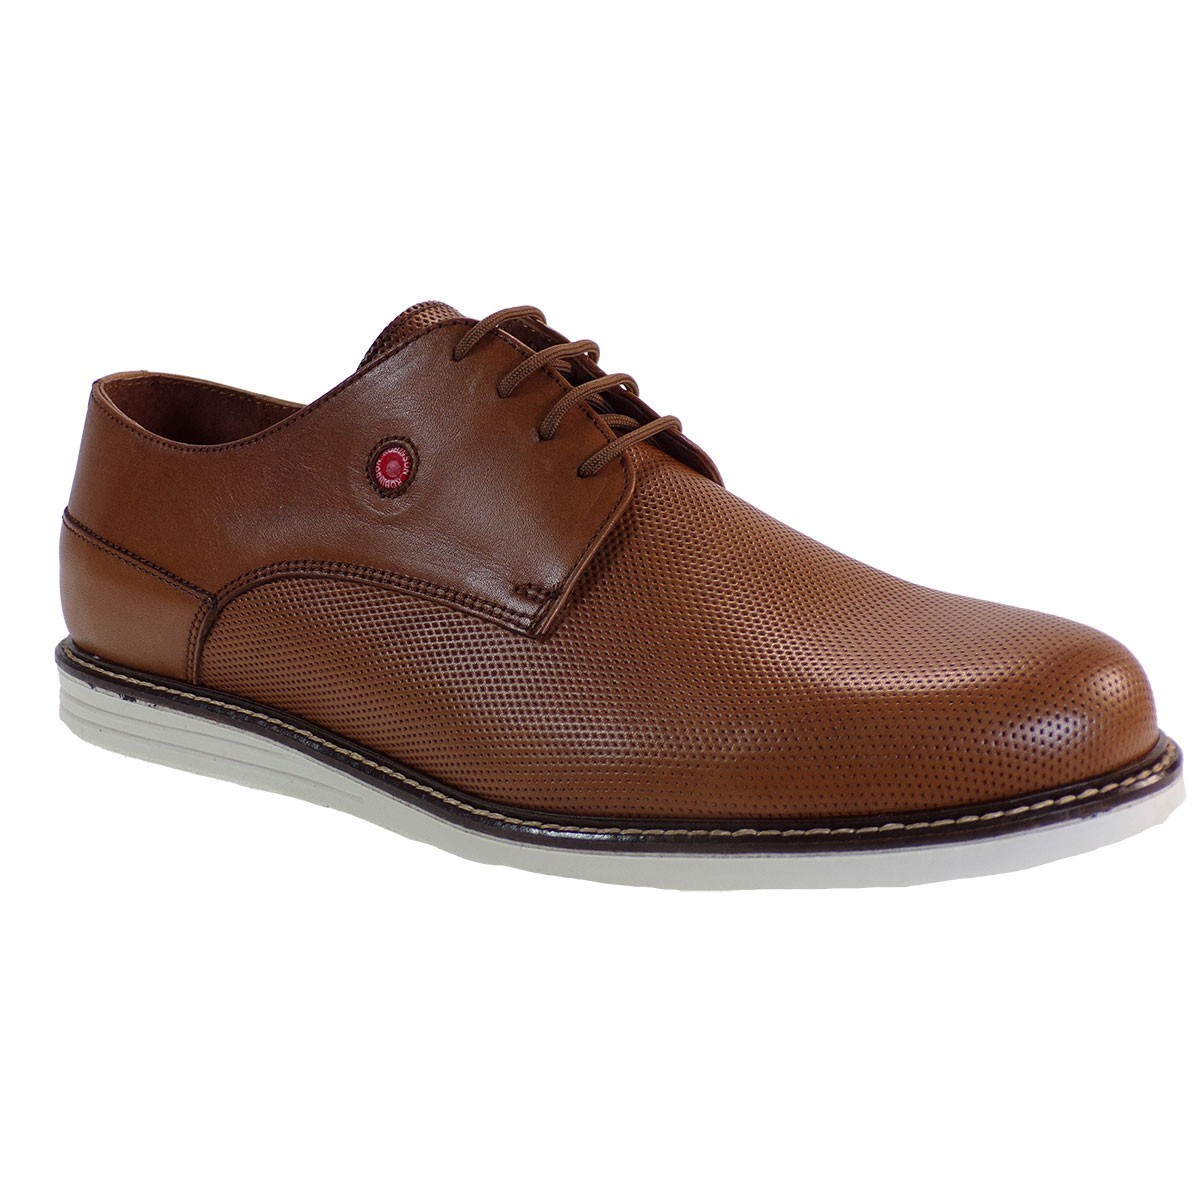 Robinson Ανδρικά Παπούτσια 1927 Ταμπά Δέρμα